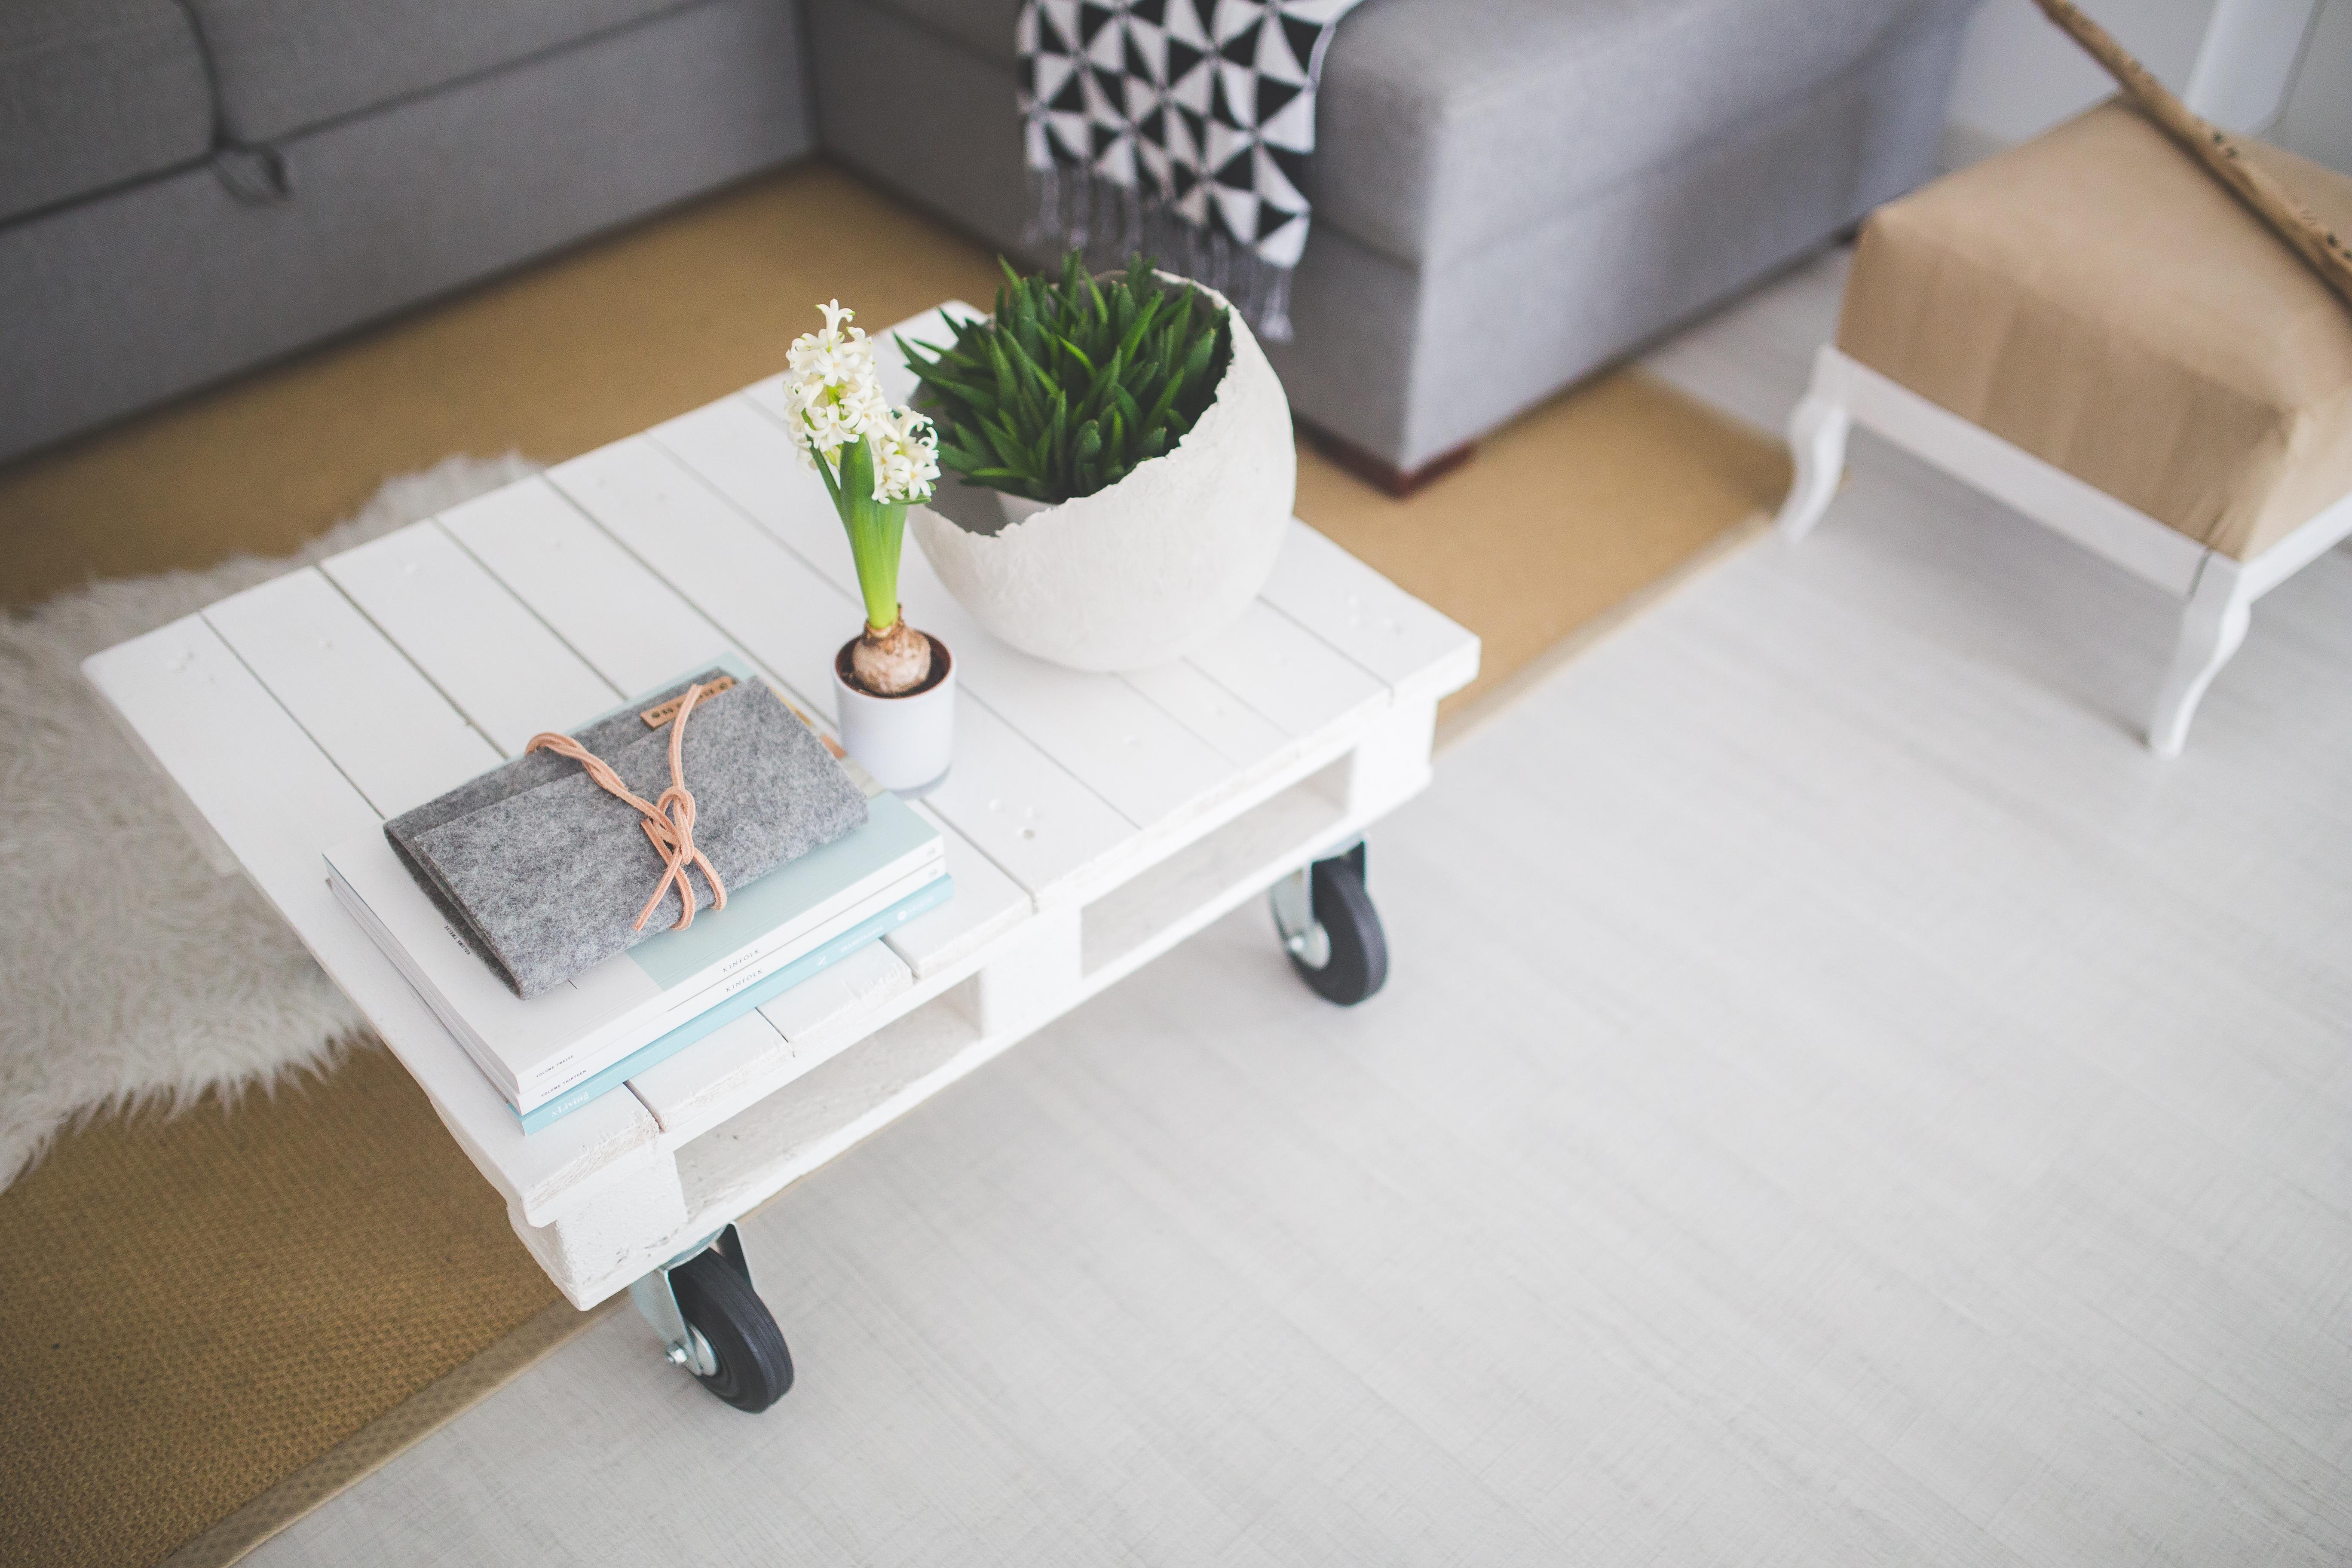 Free Images : desk, wood, white, floor, interior, home, living room ...